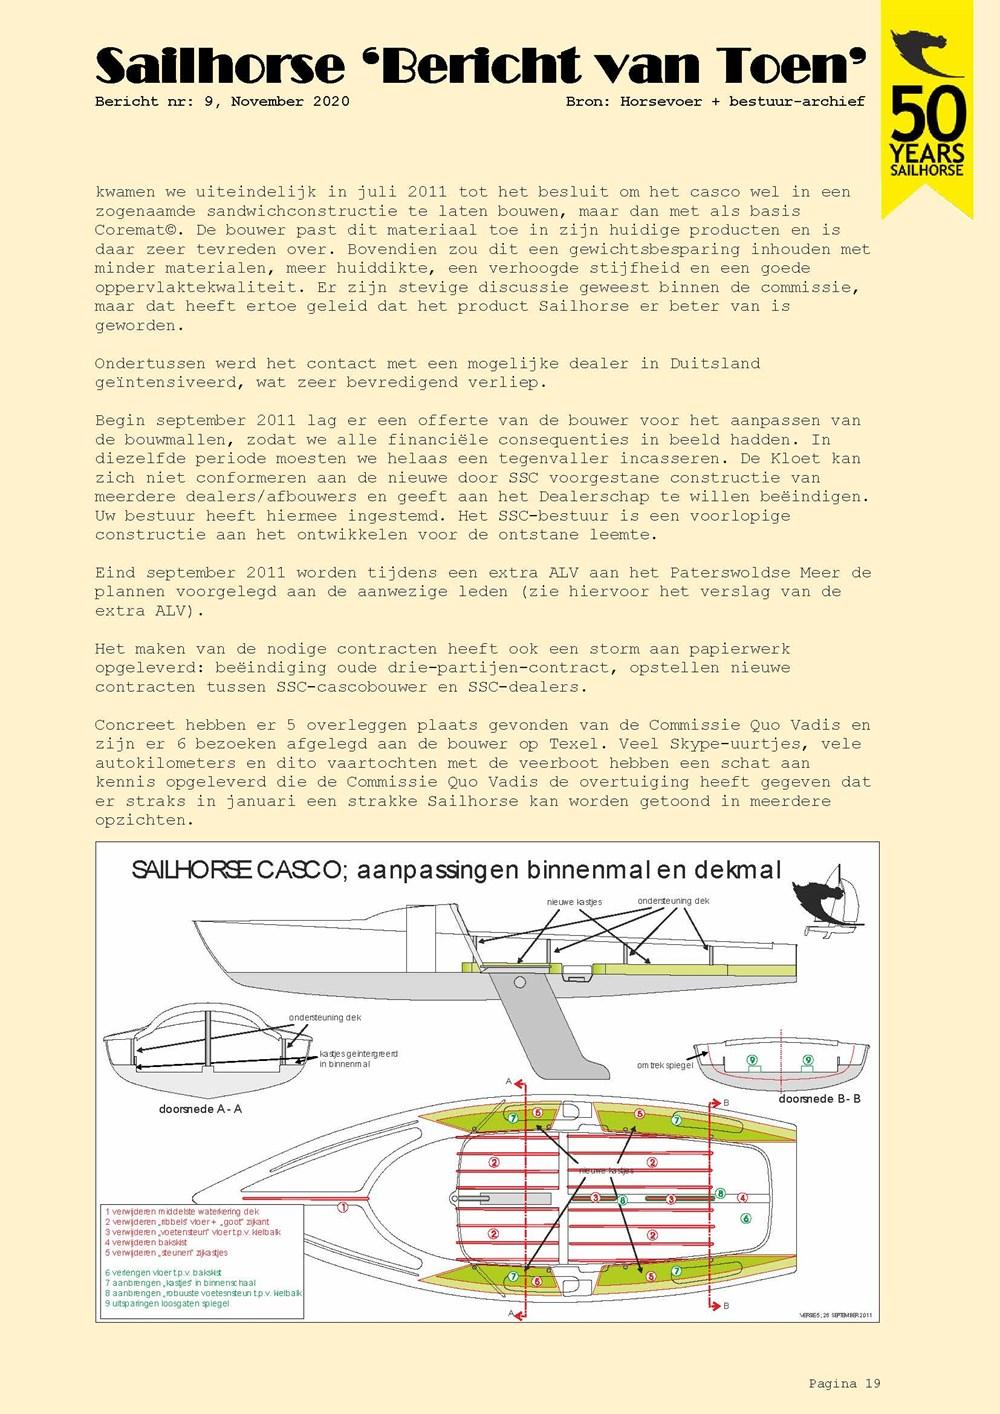 BvT09_Page_19.jpg